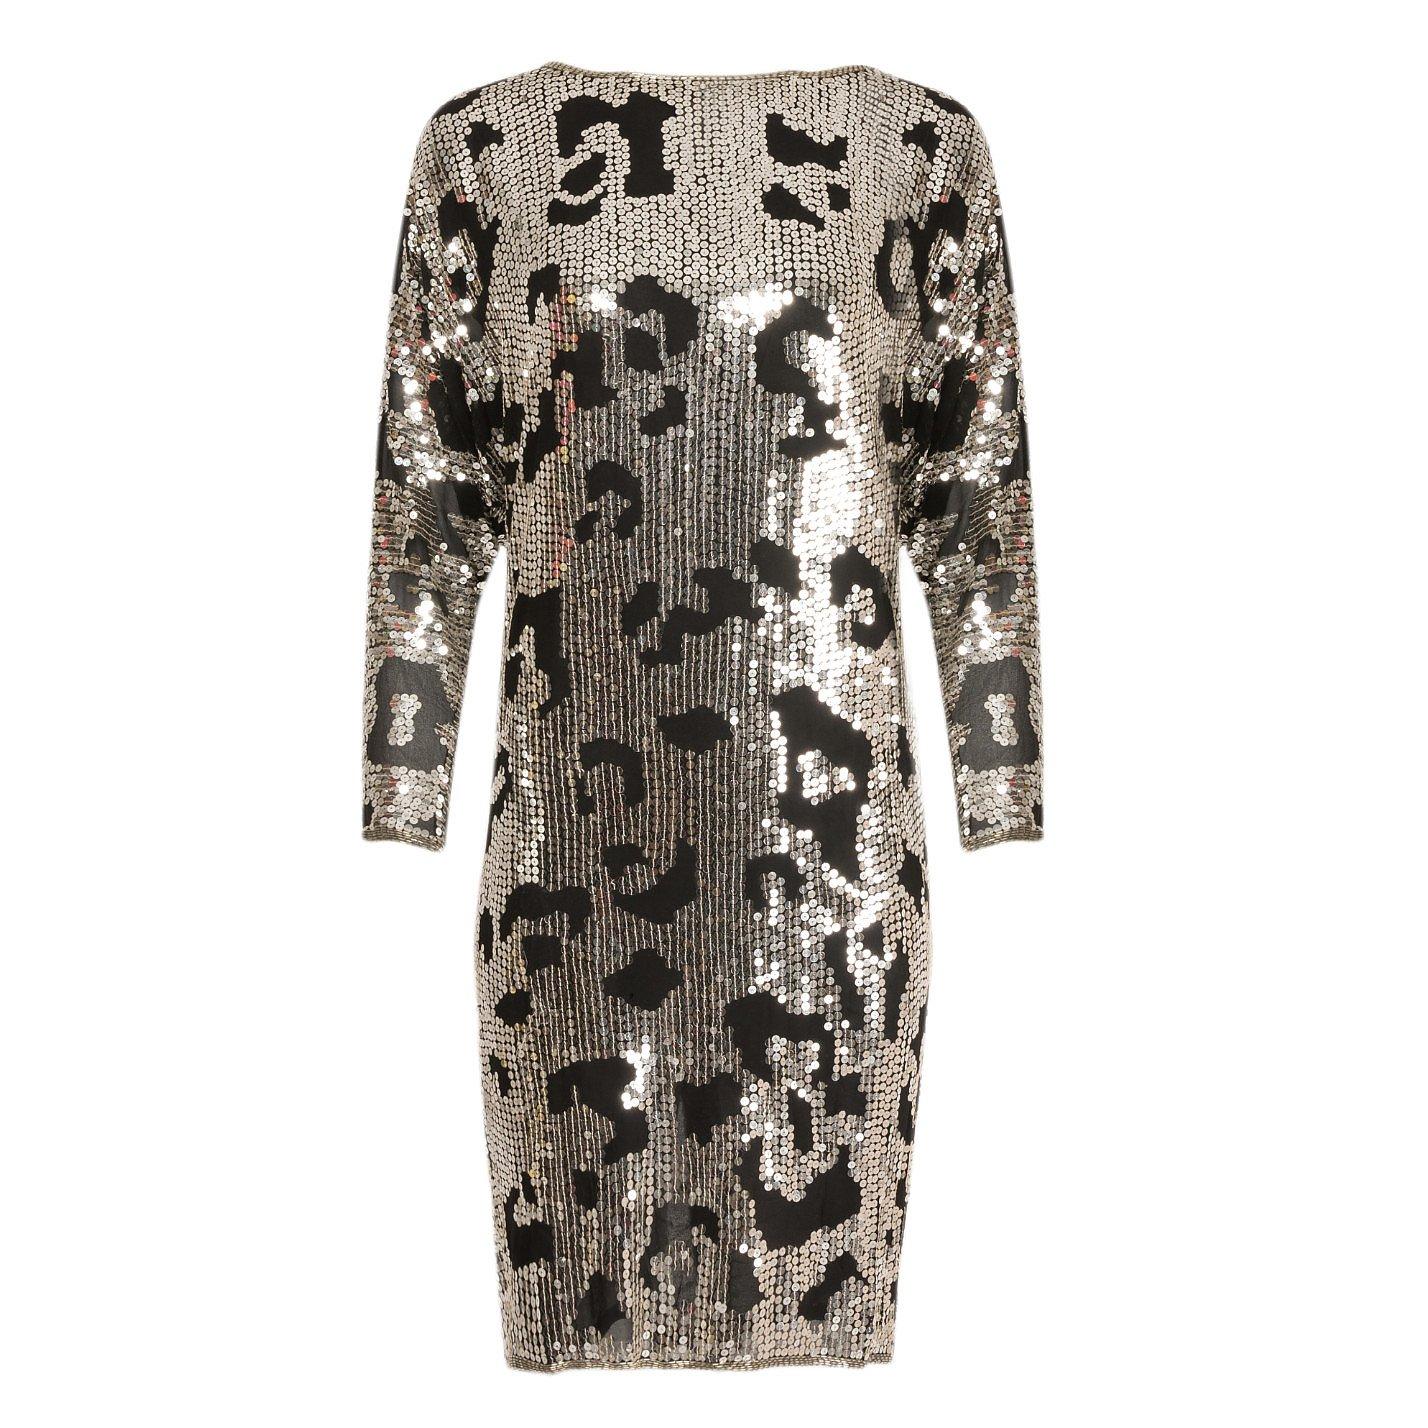 Vintage Couture Sequin Tunic Dress